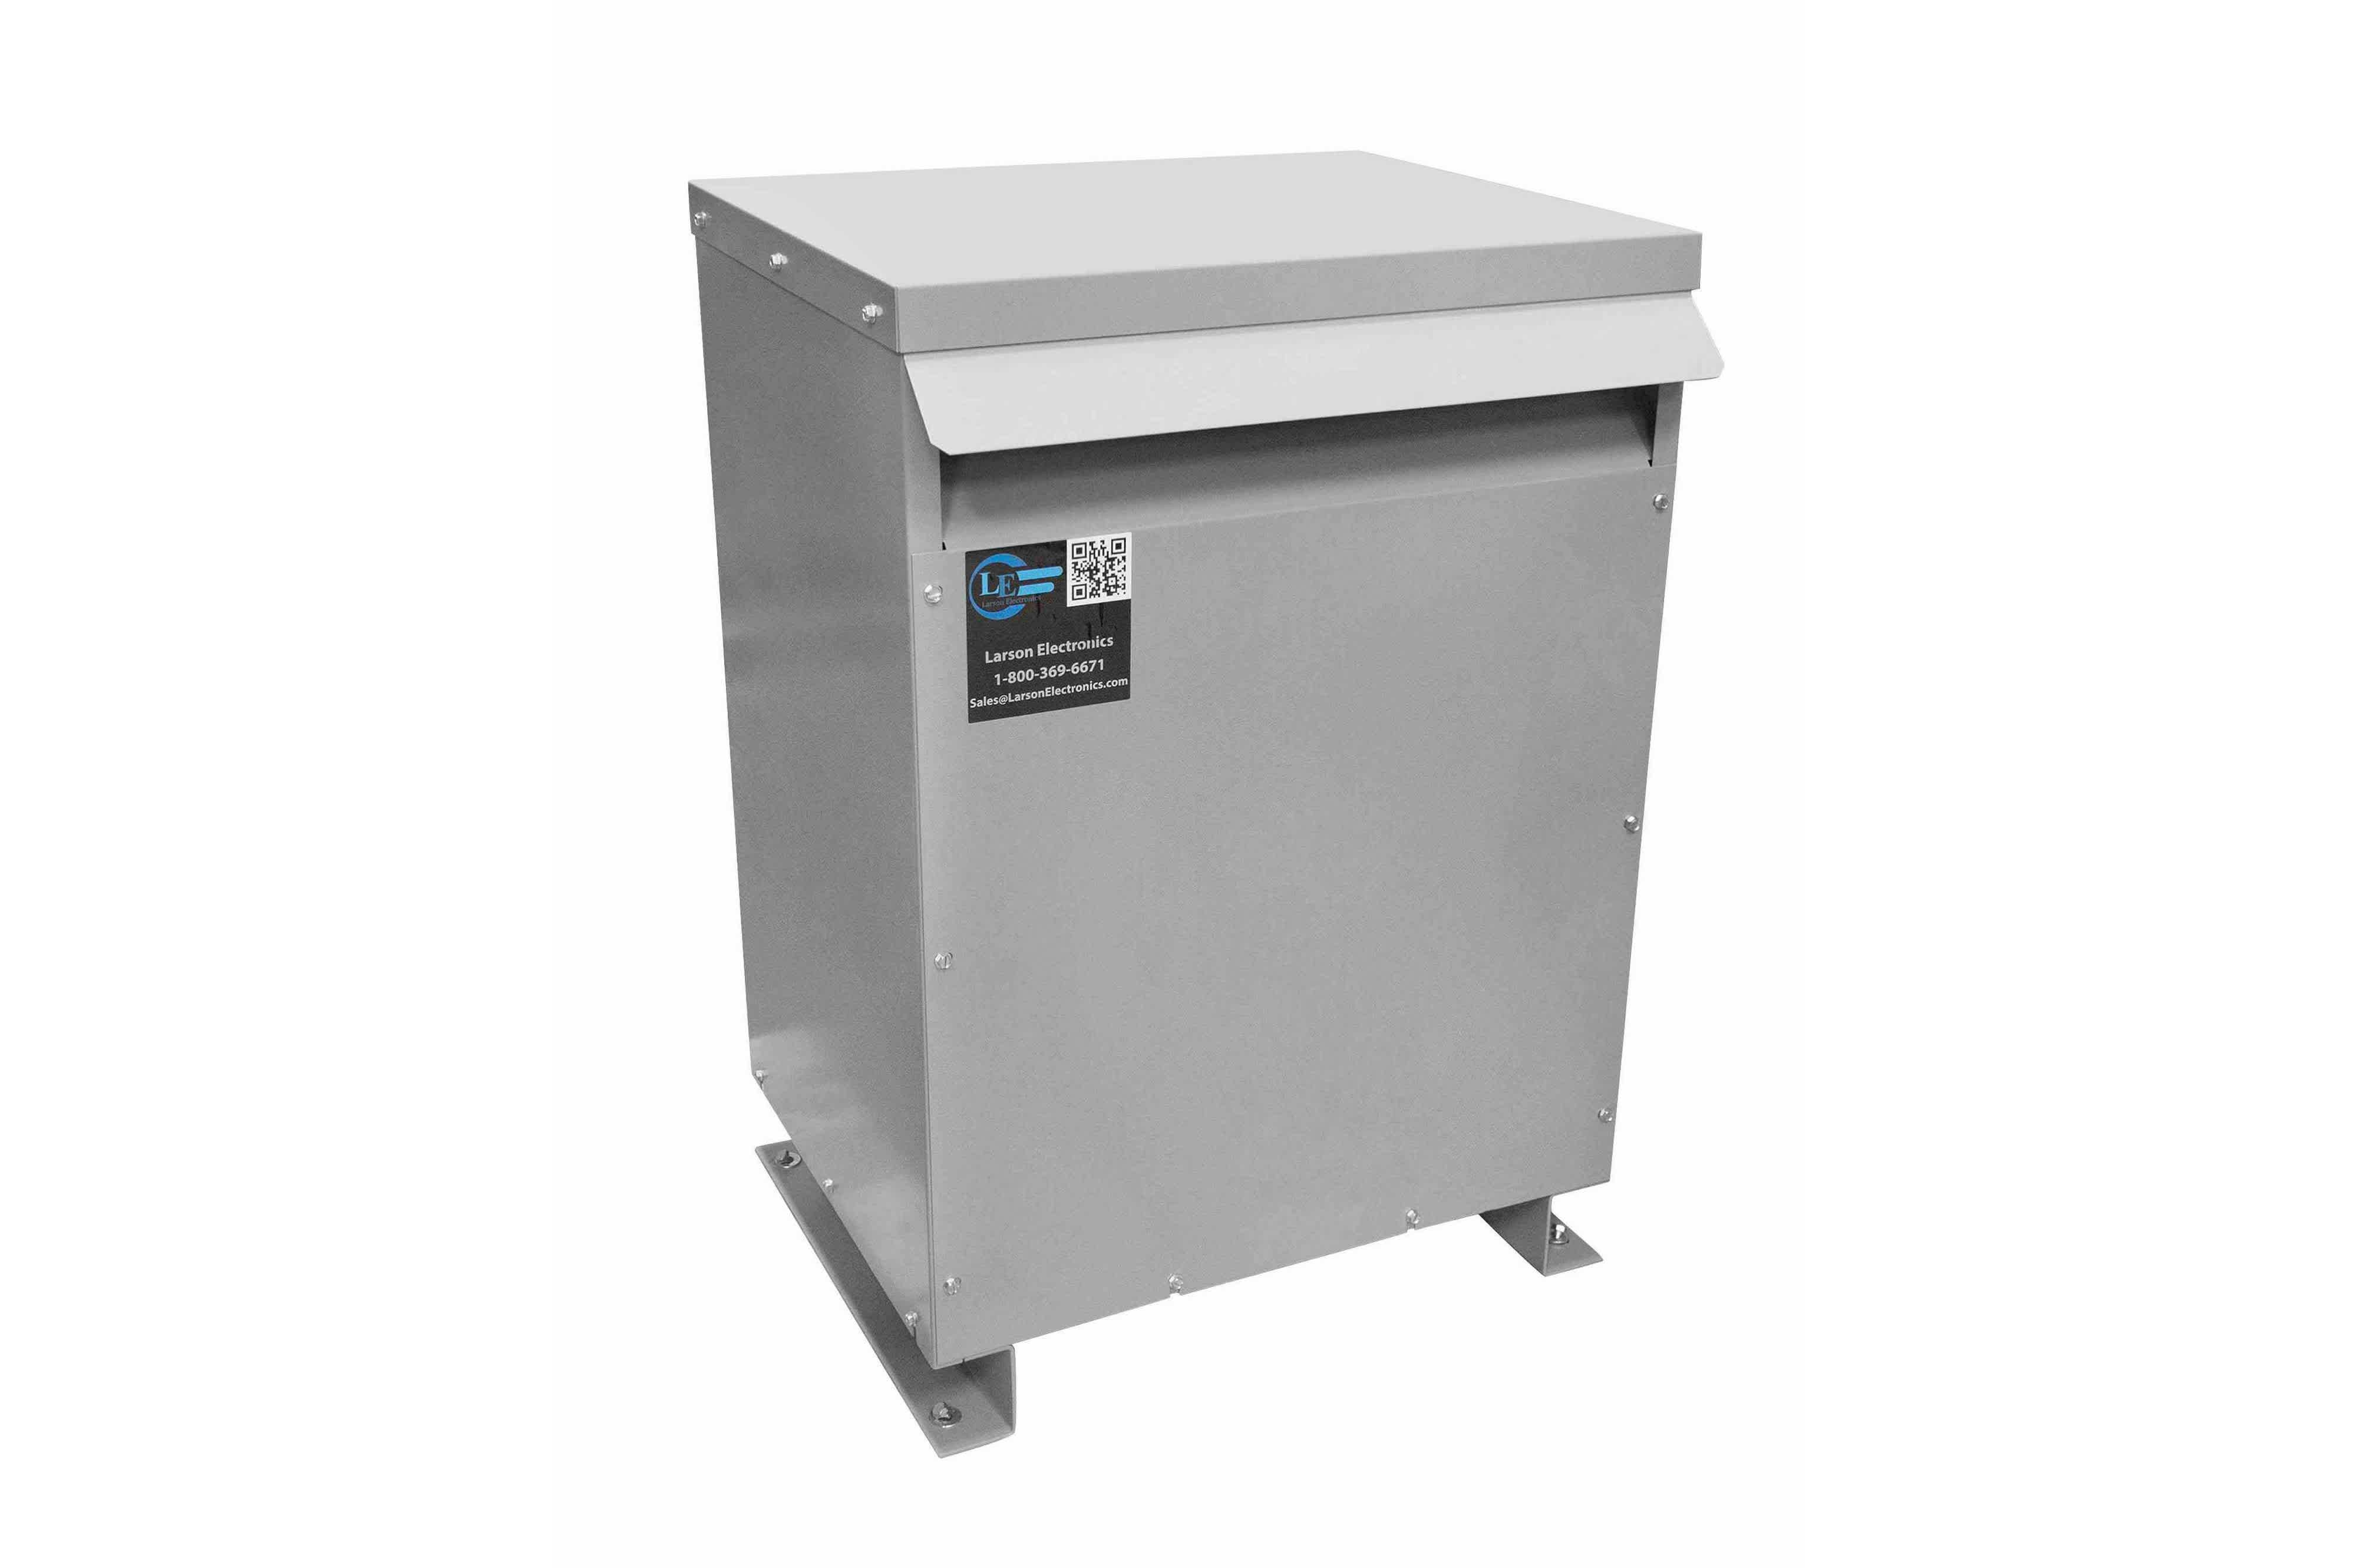 60 kVA 3PH Isolation Transformer, 575V Wye Primary, 240V Delta Secondary, N3R, Ventilated, 60 Hz